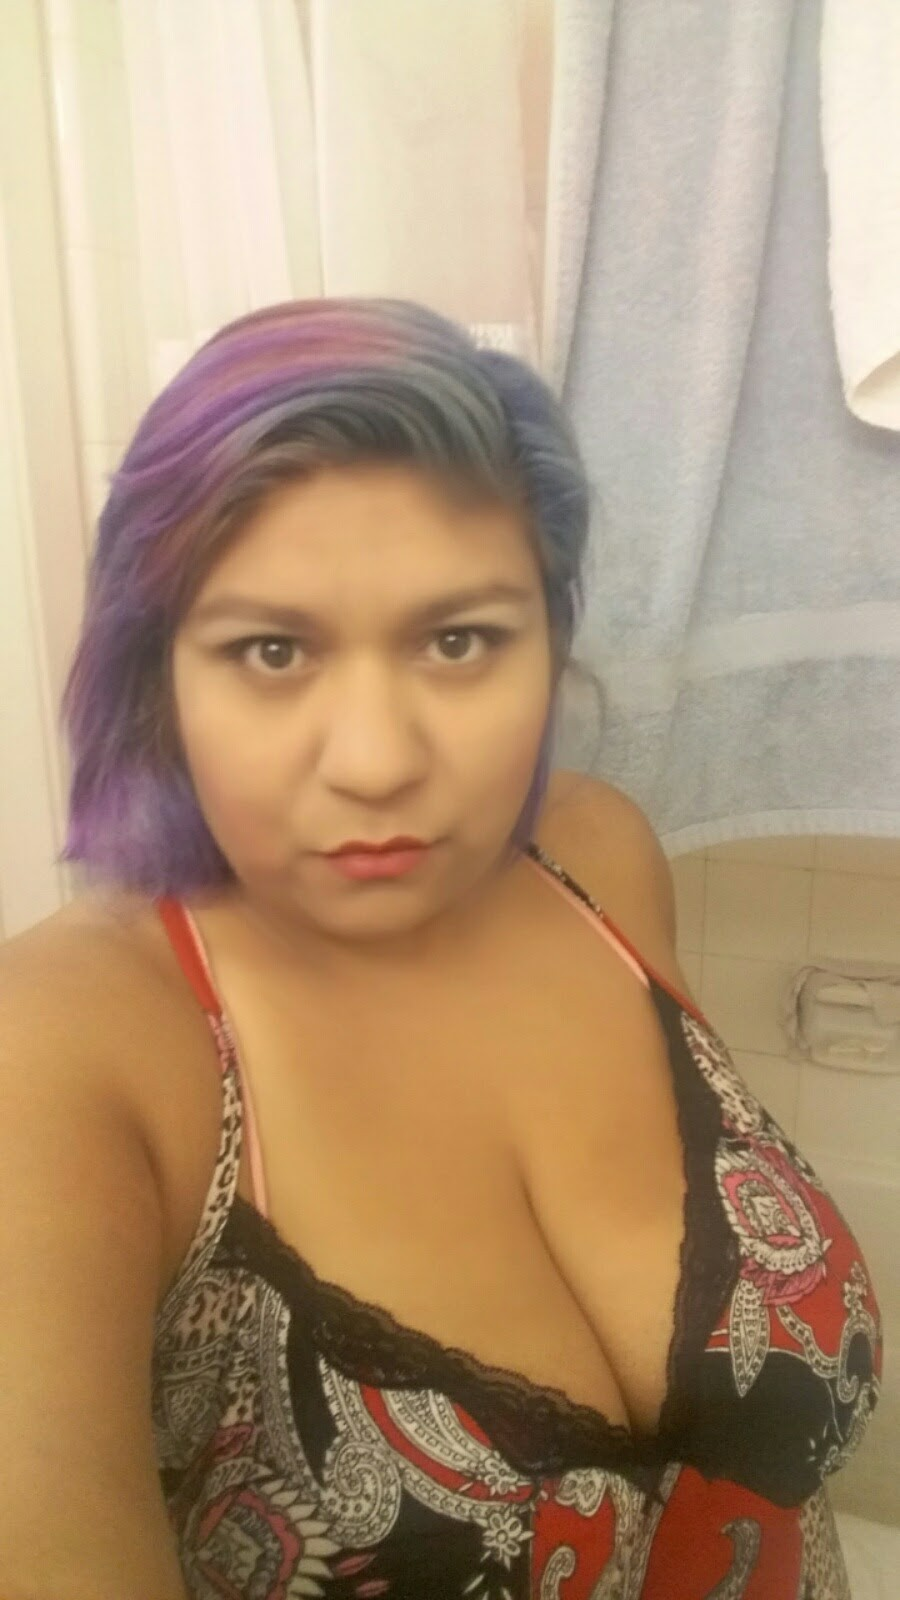 Hispanic Honey ready to pamper you.... Good girl with very naughty habits...